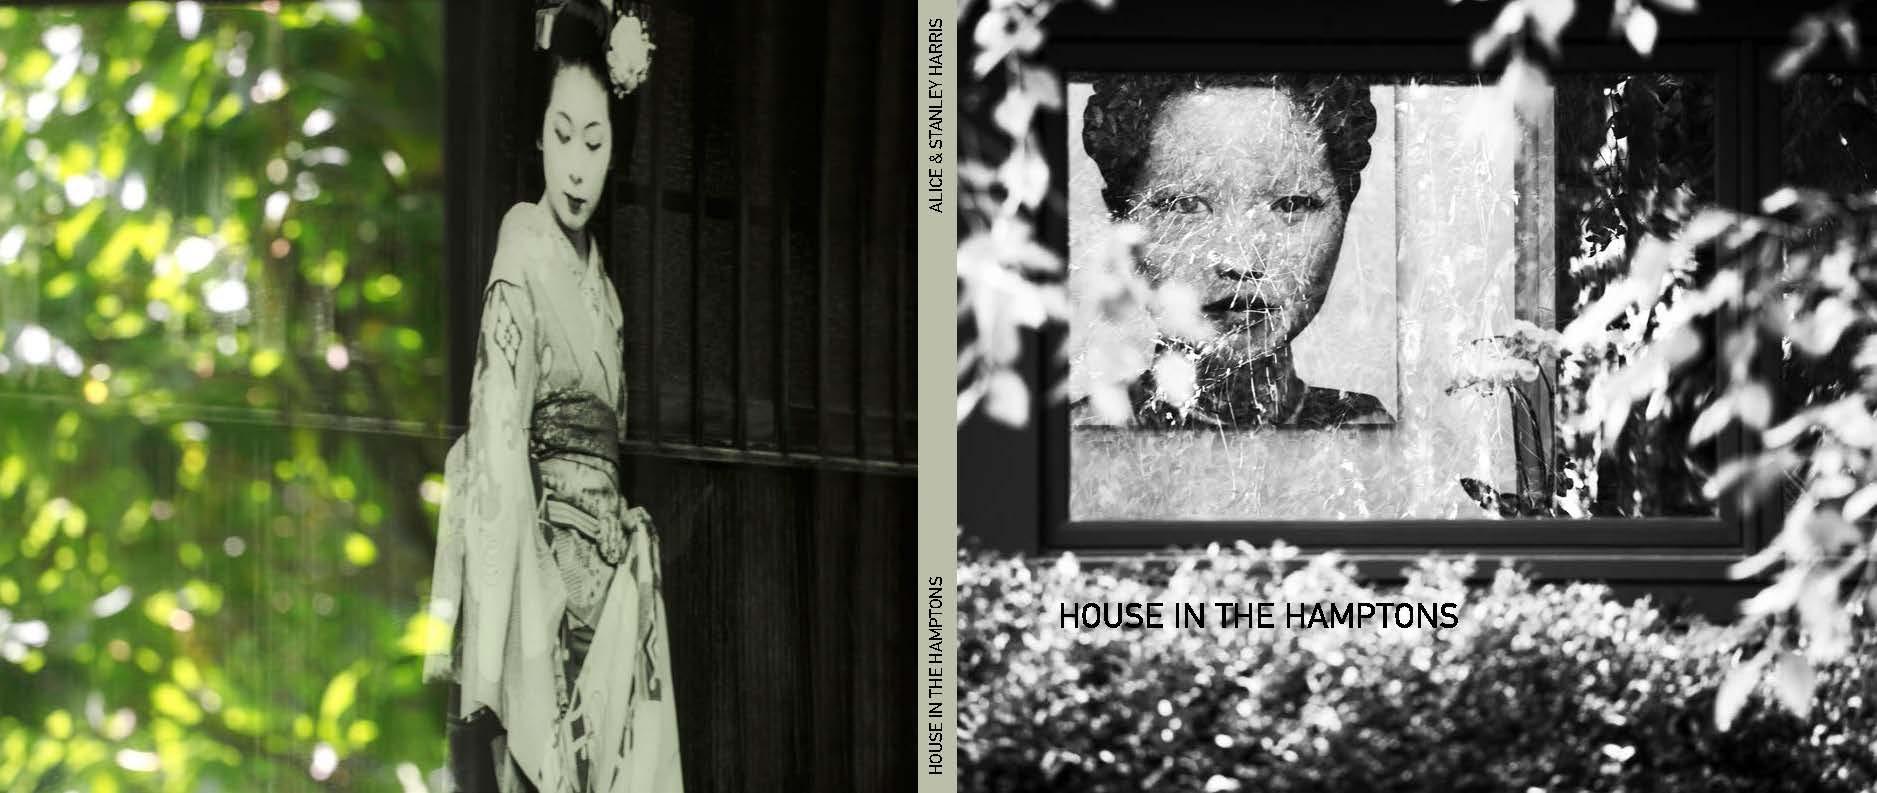 HOUSE IN THE HAMPTONS-ALICE & STANLEY HARRIS_Page_01.jpg